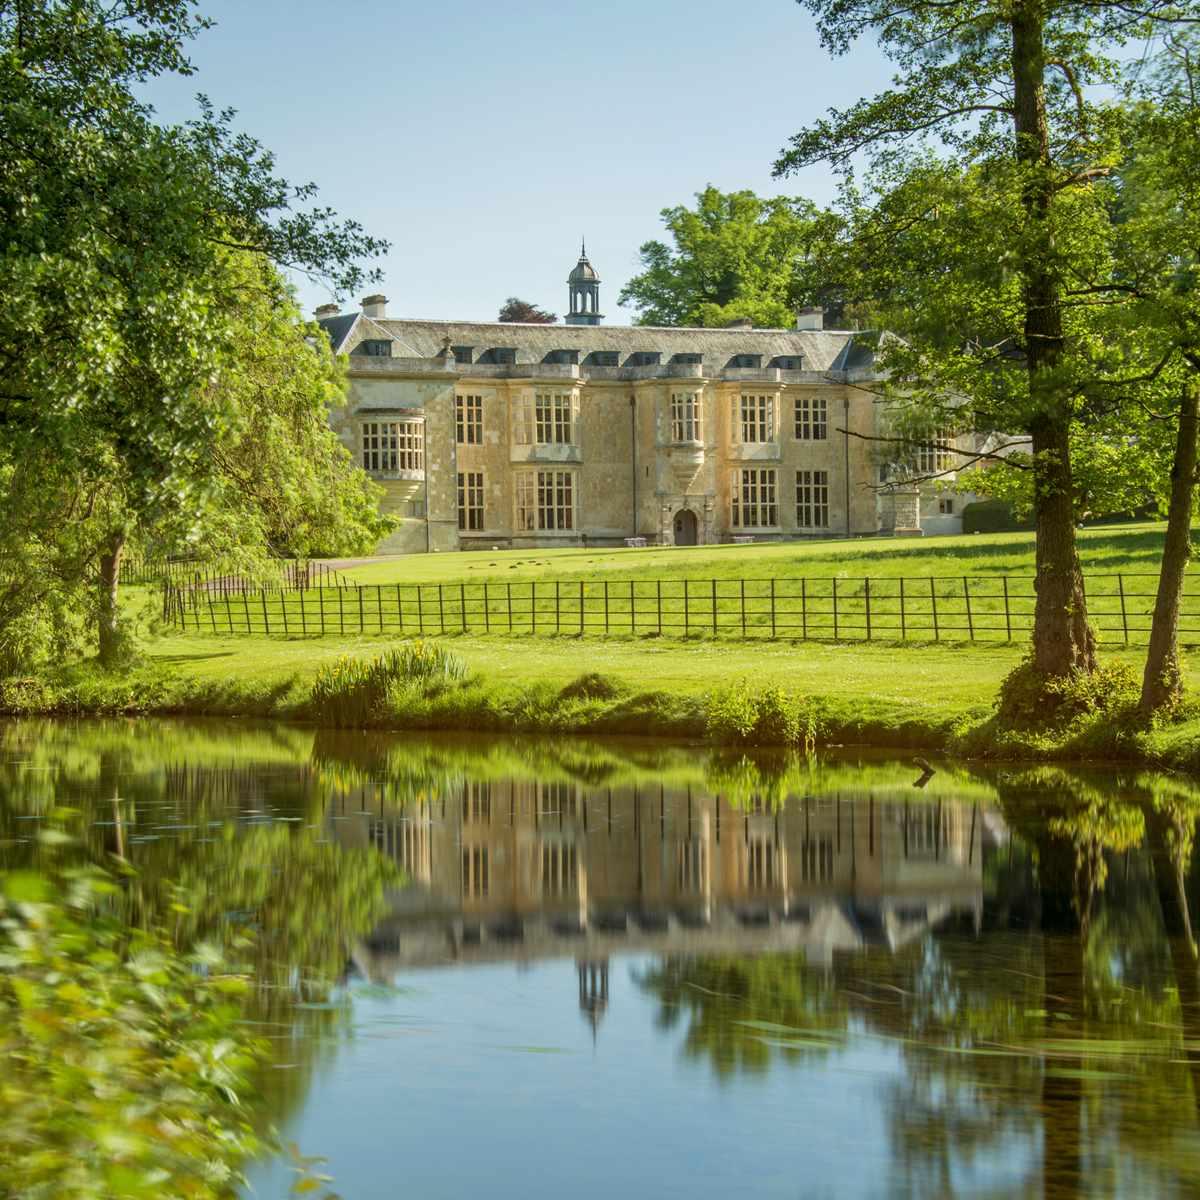 Luxury Hotel & Spa Amersham Buckinghamshire | Hartwell House